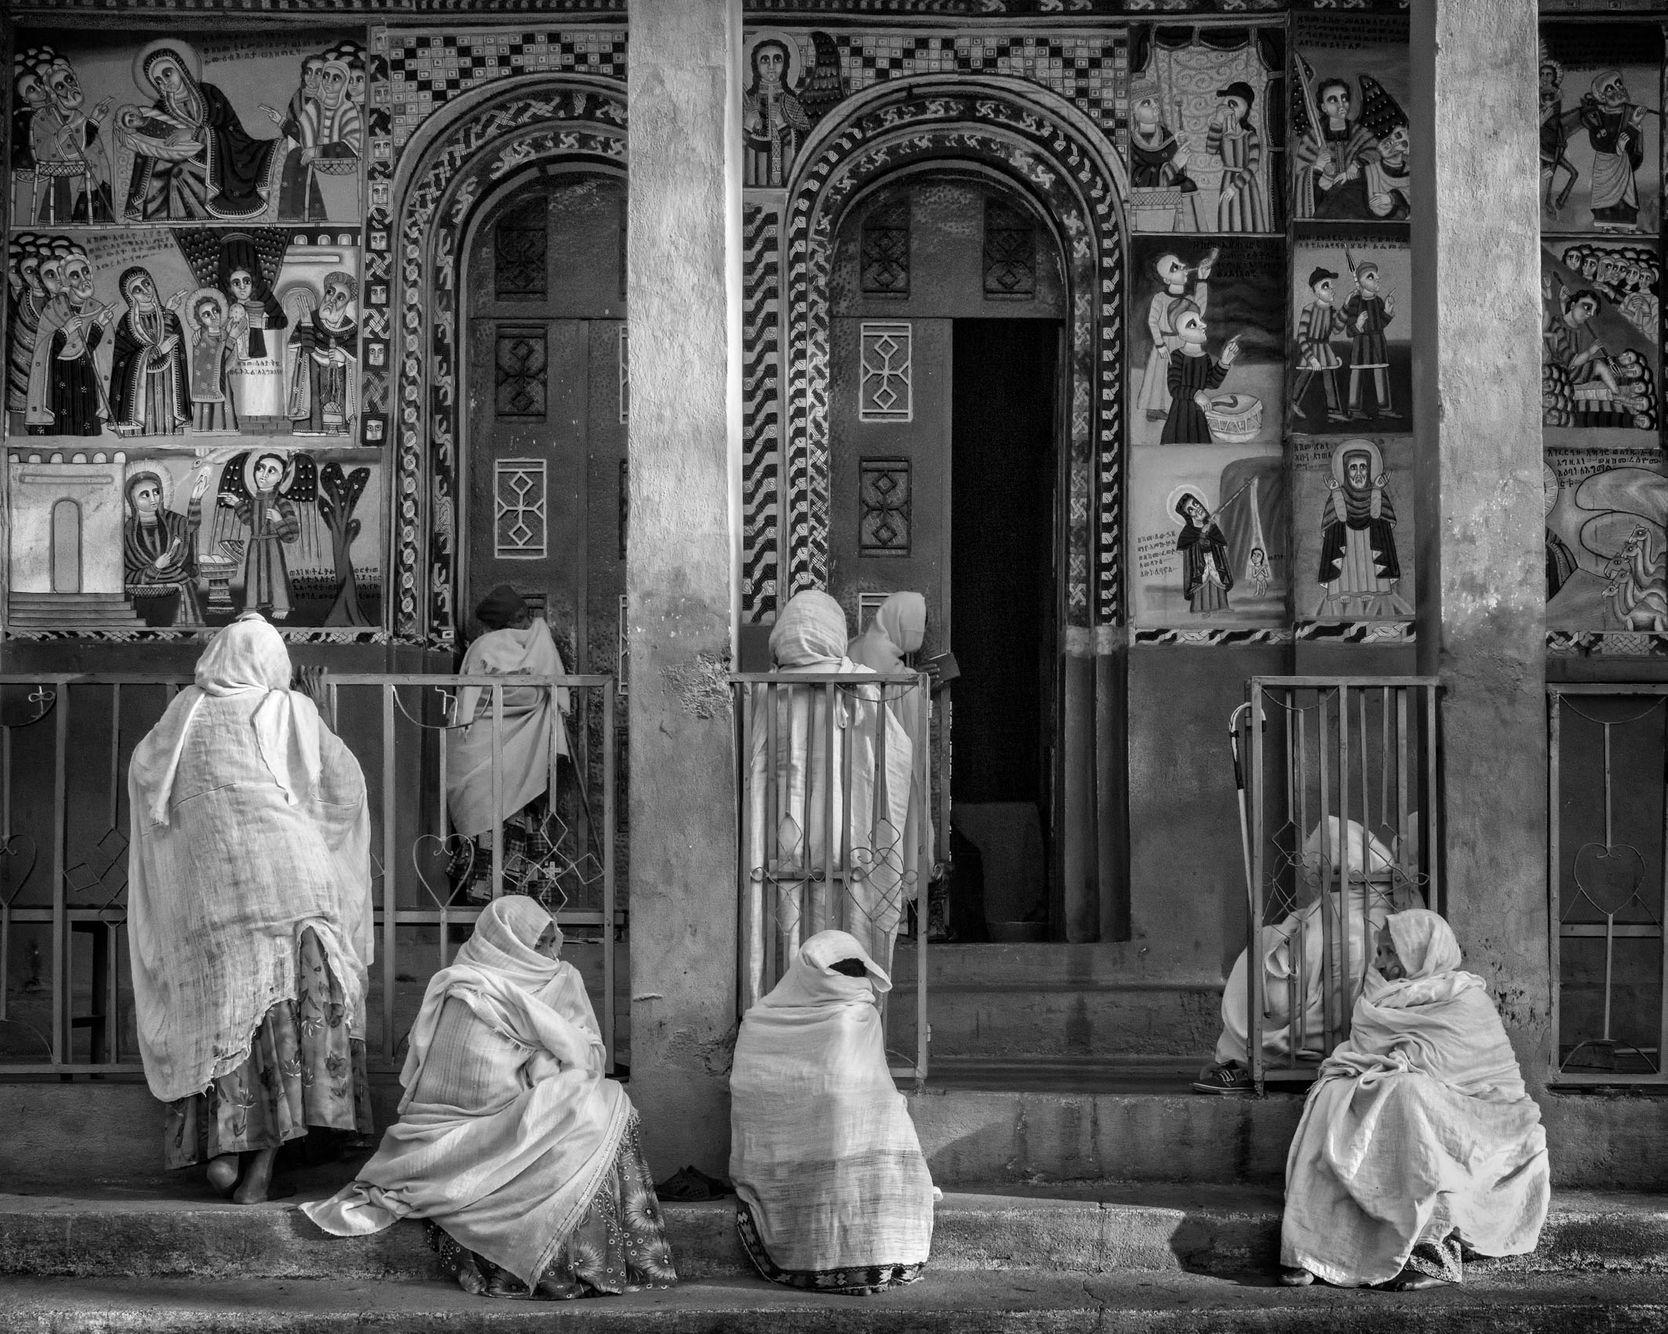 ETHIOPIA:  Children of Solomon and Sheba:  The Ethiopian Orthodox Church